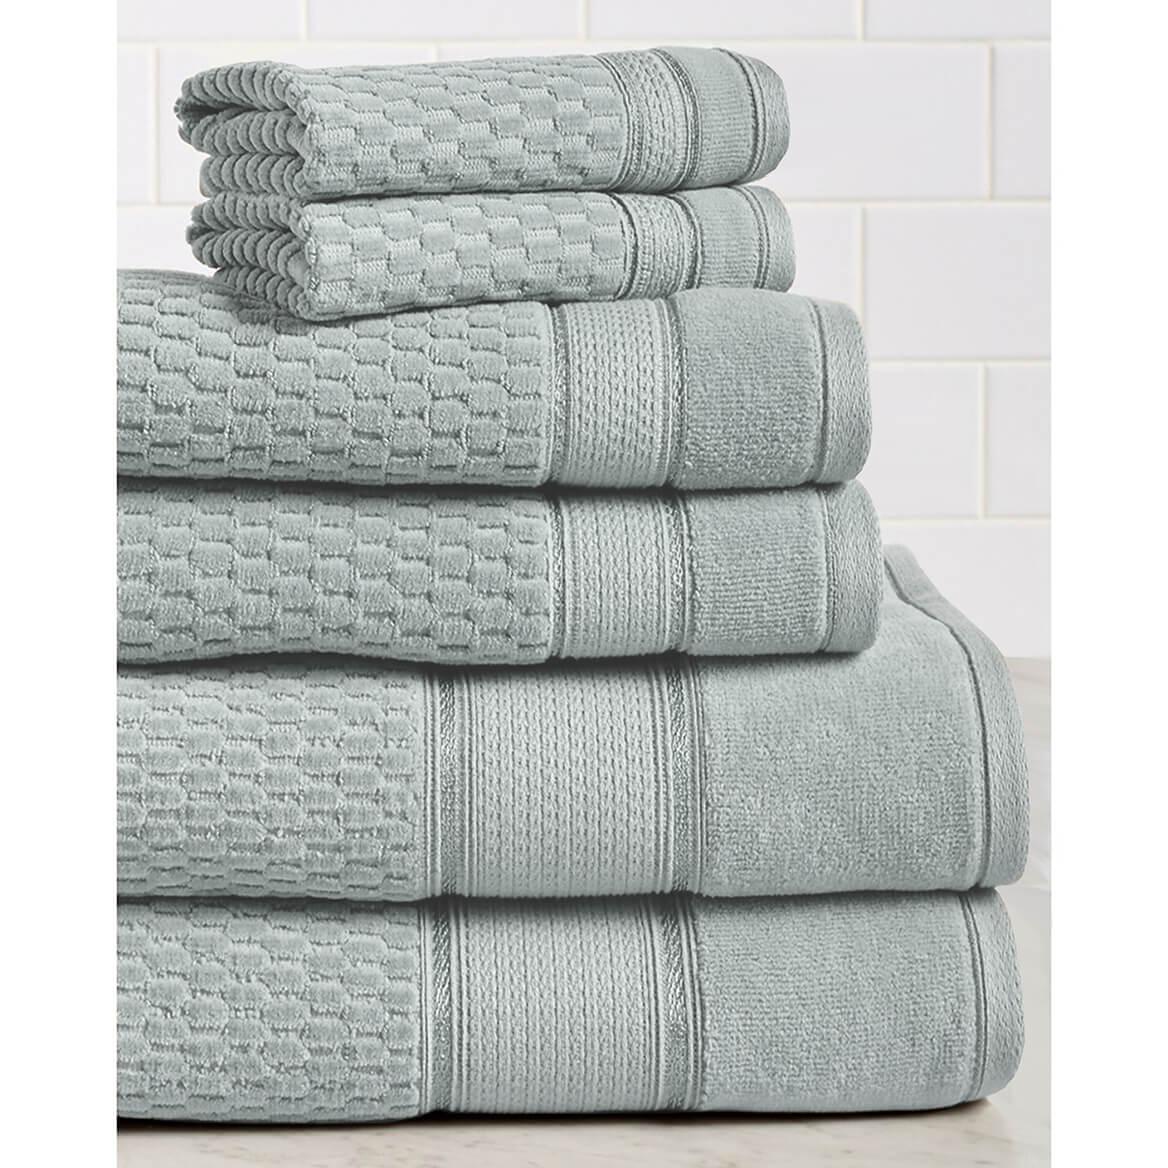 Espalma Royale 6-Piece Towel Set-362663